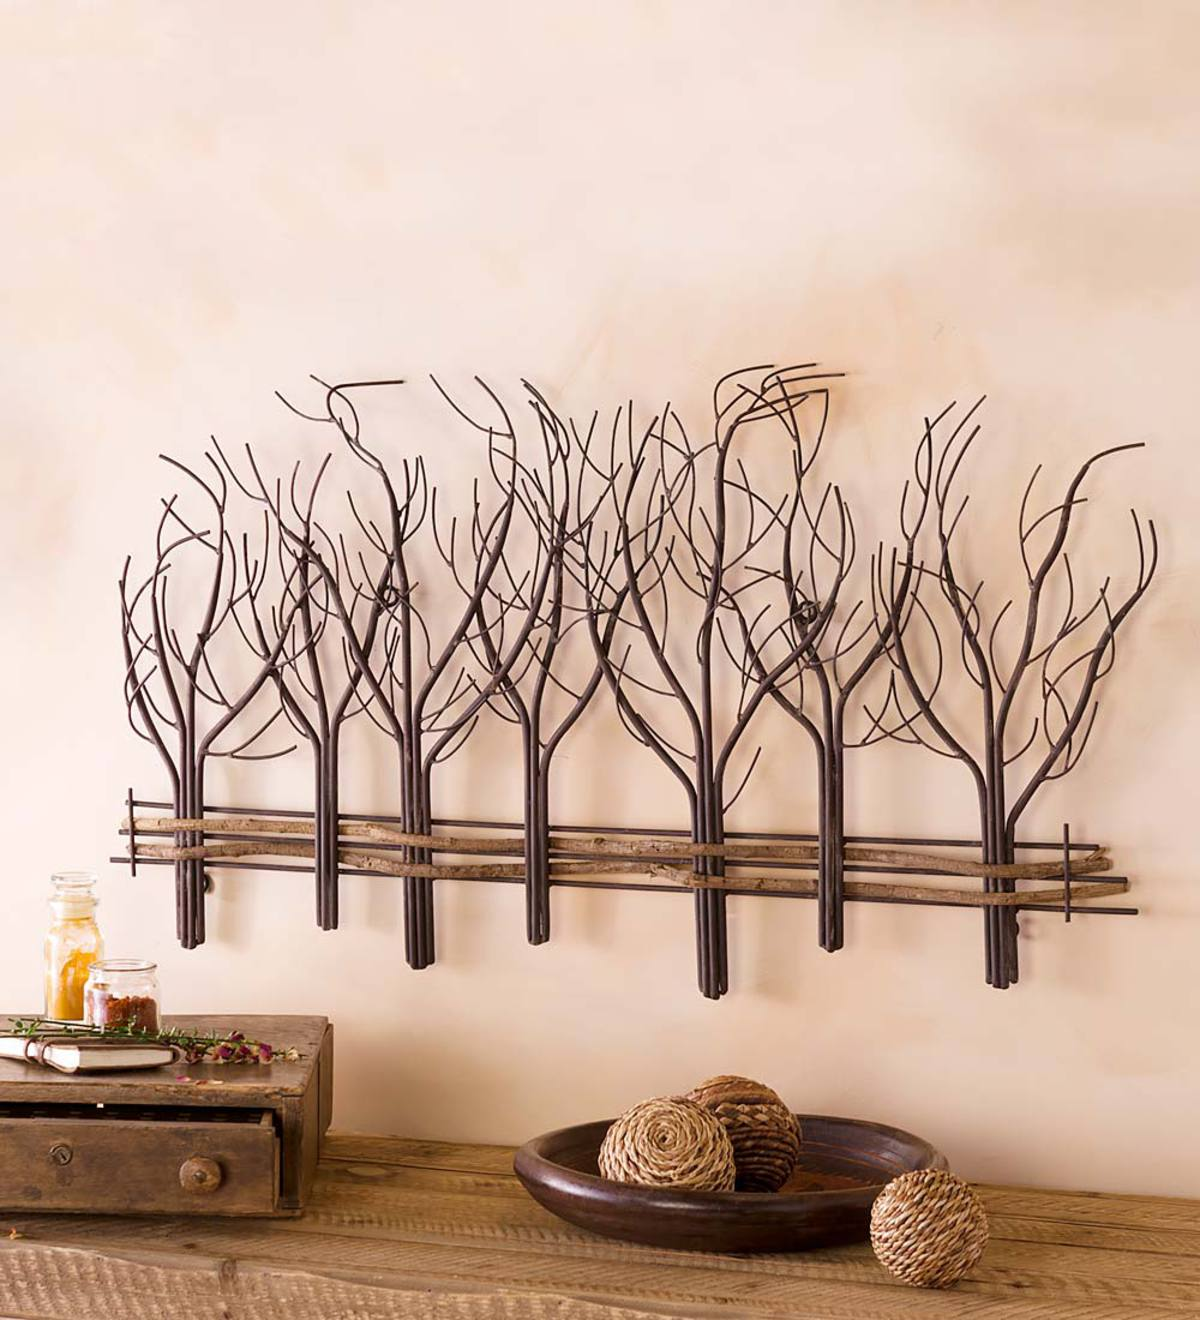 Metal and Natural Vine Winter Tree Wall Art | All Wall Art ...